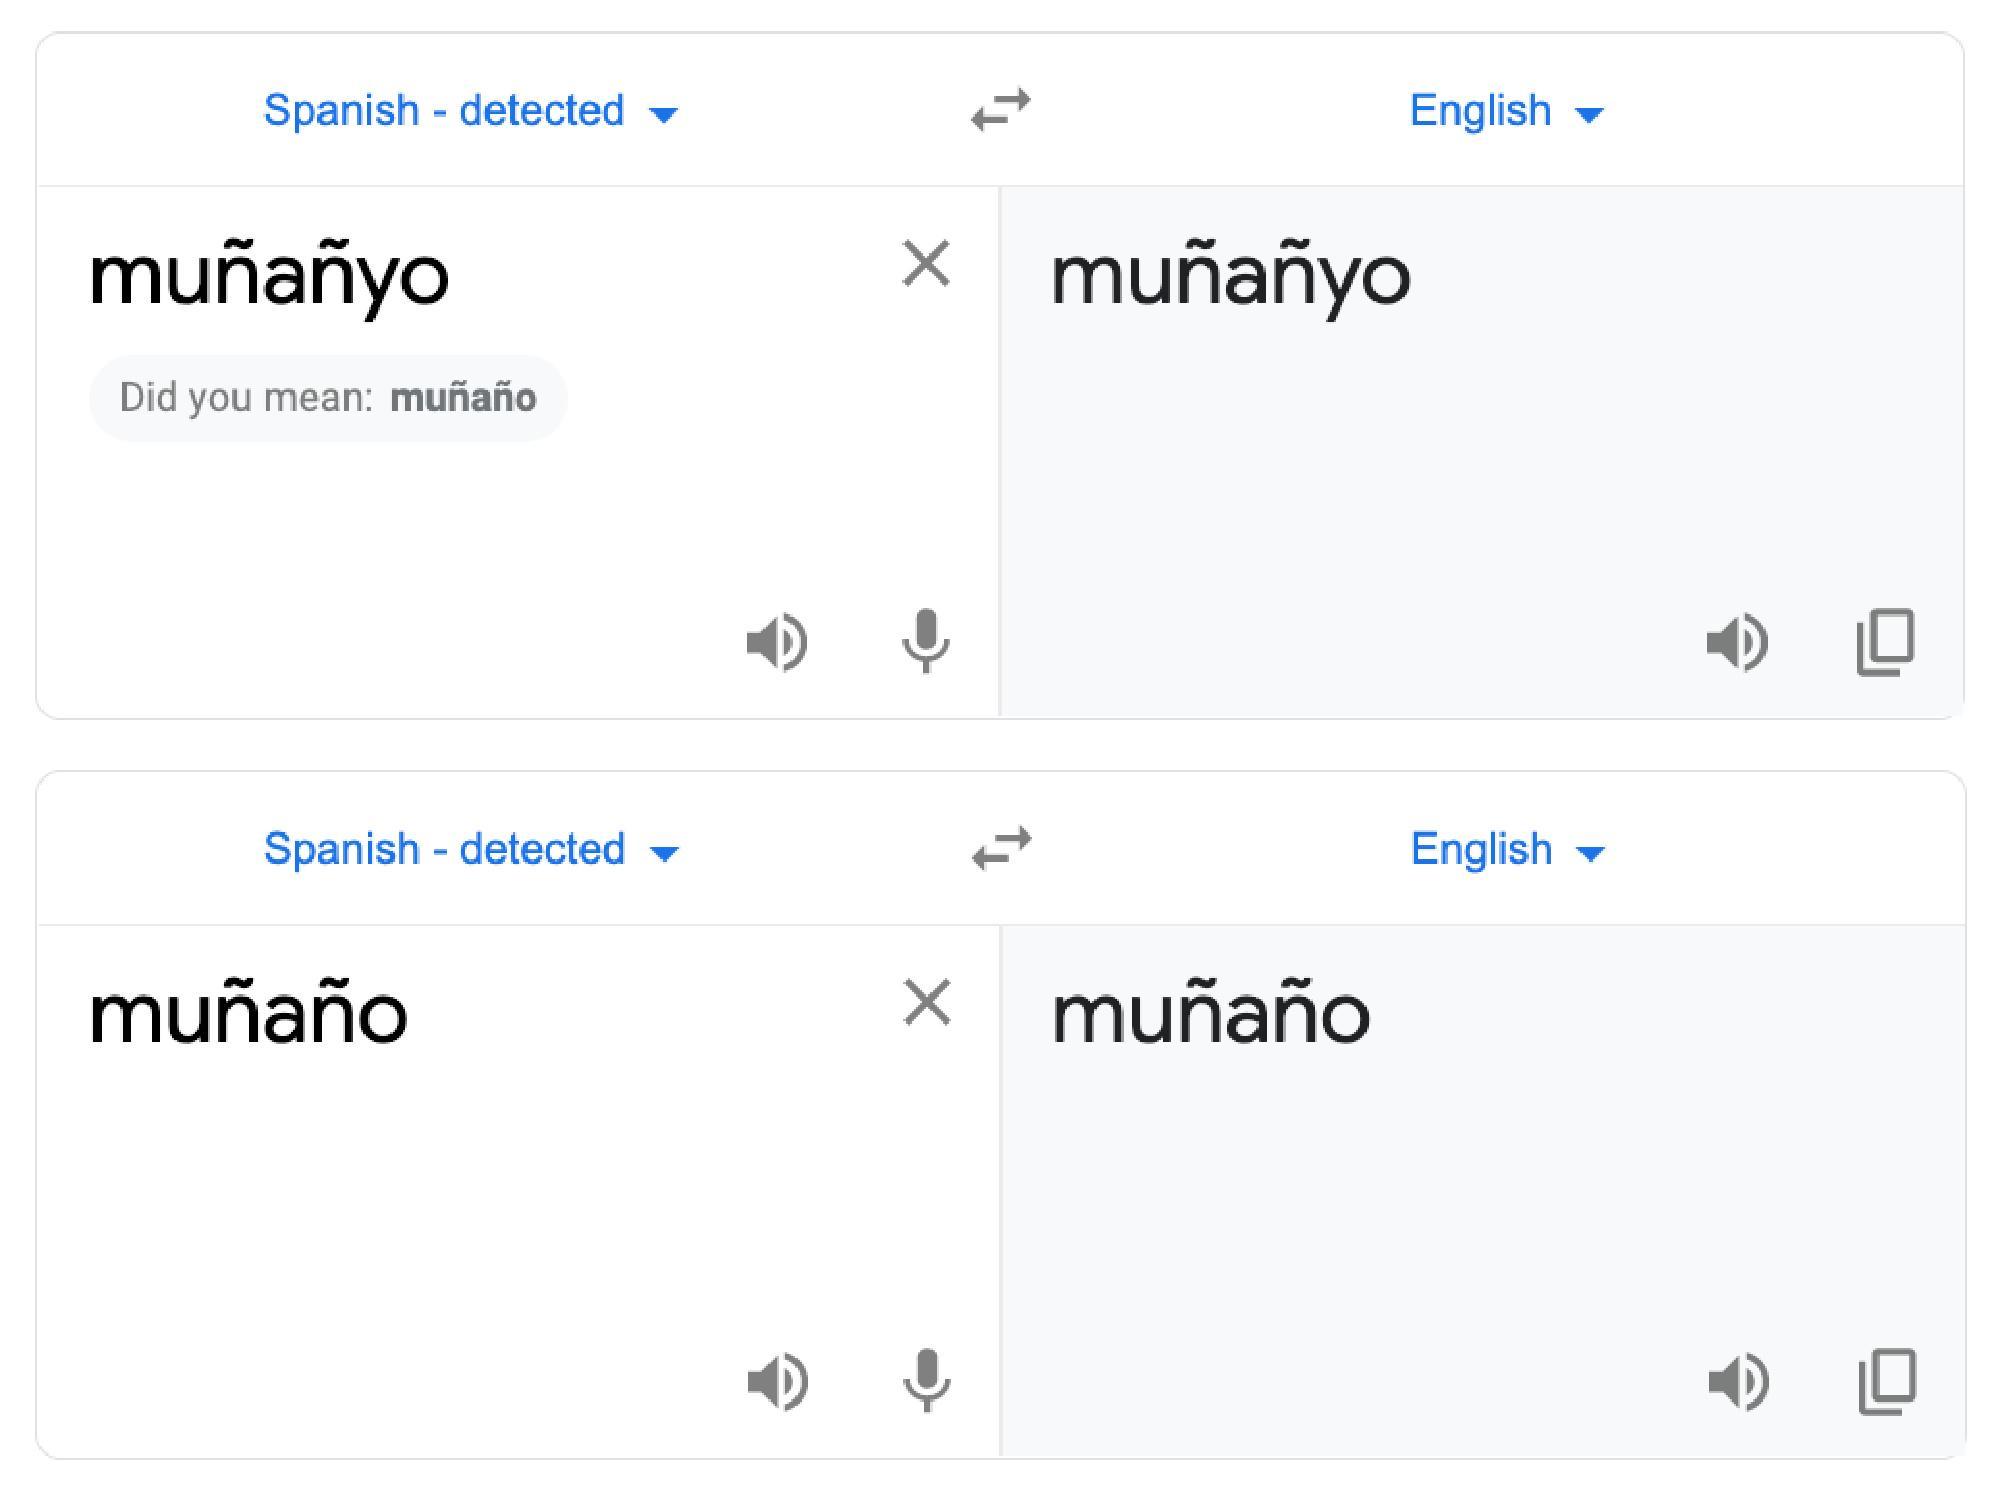 munanyo meaning spanish